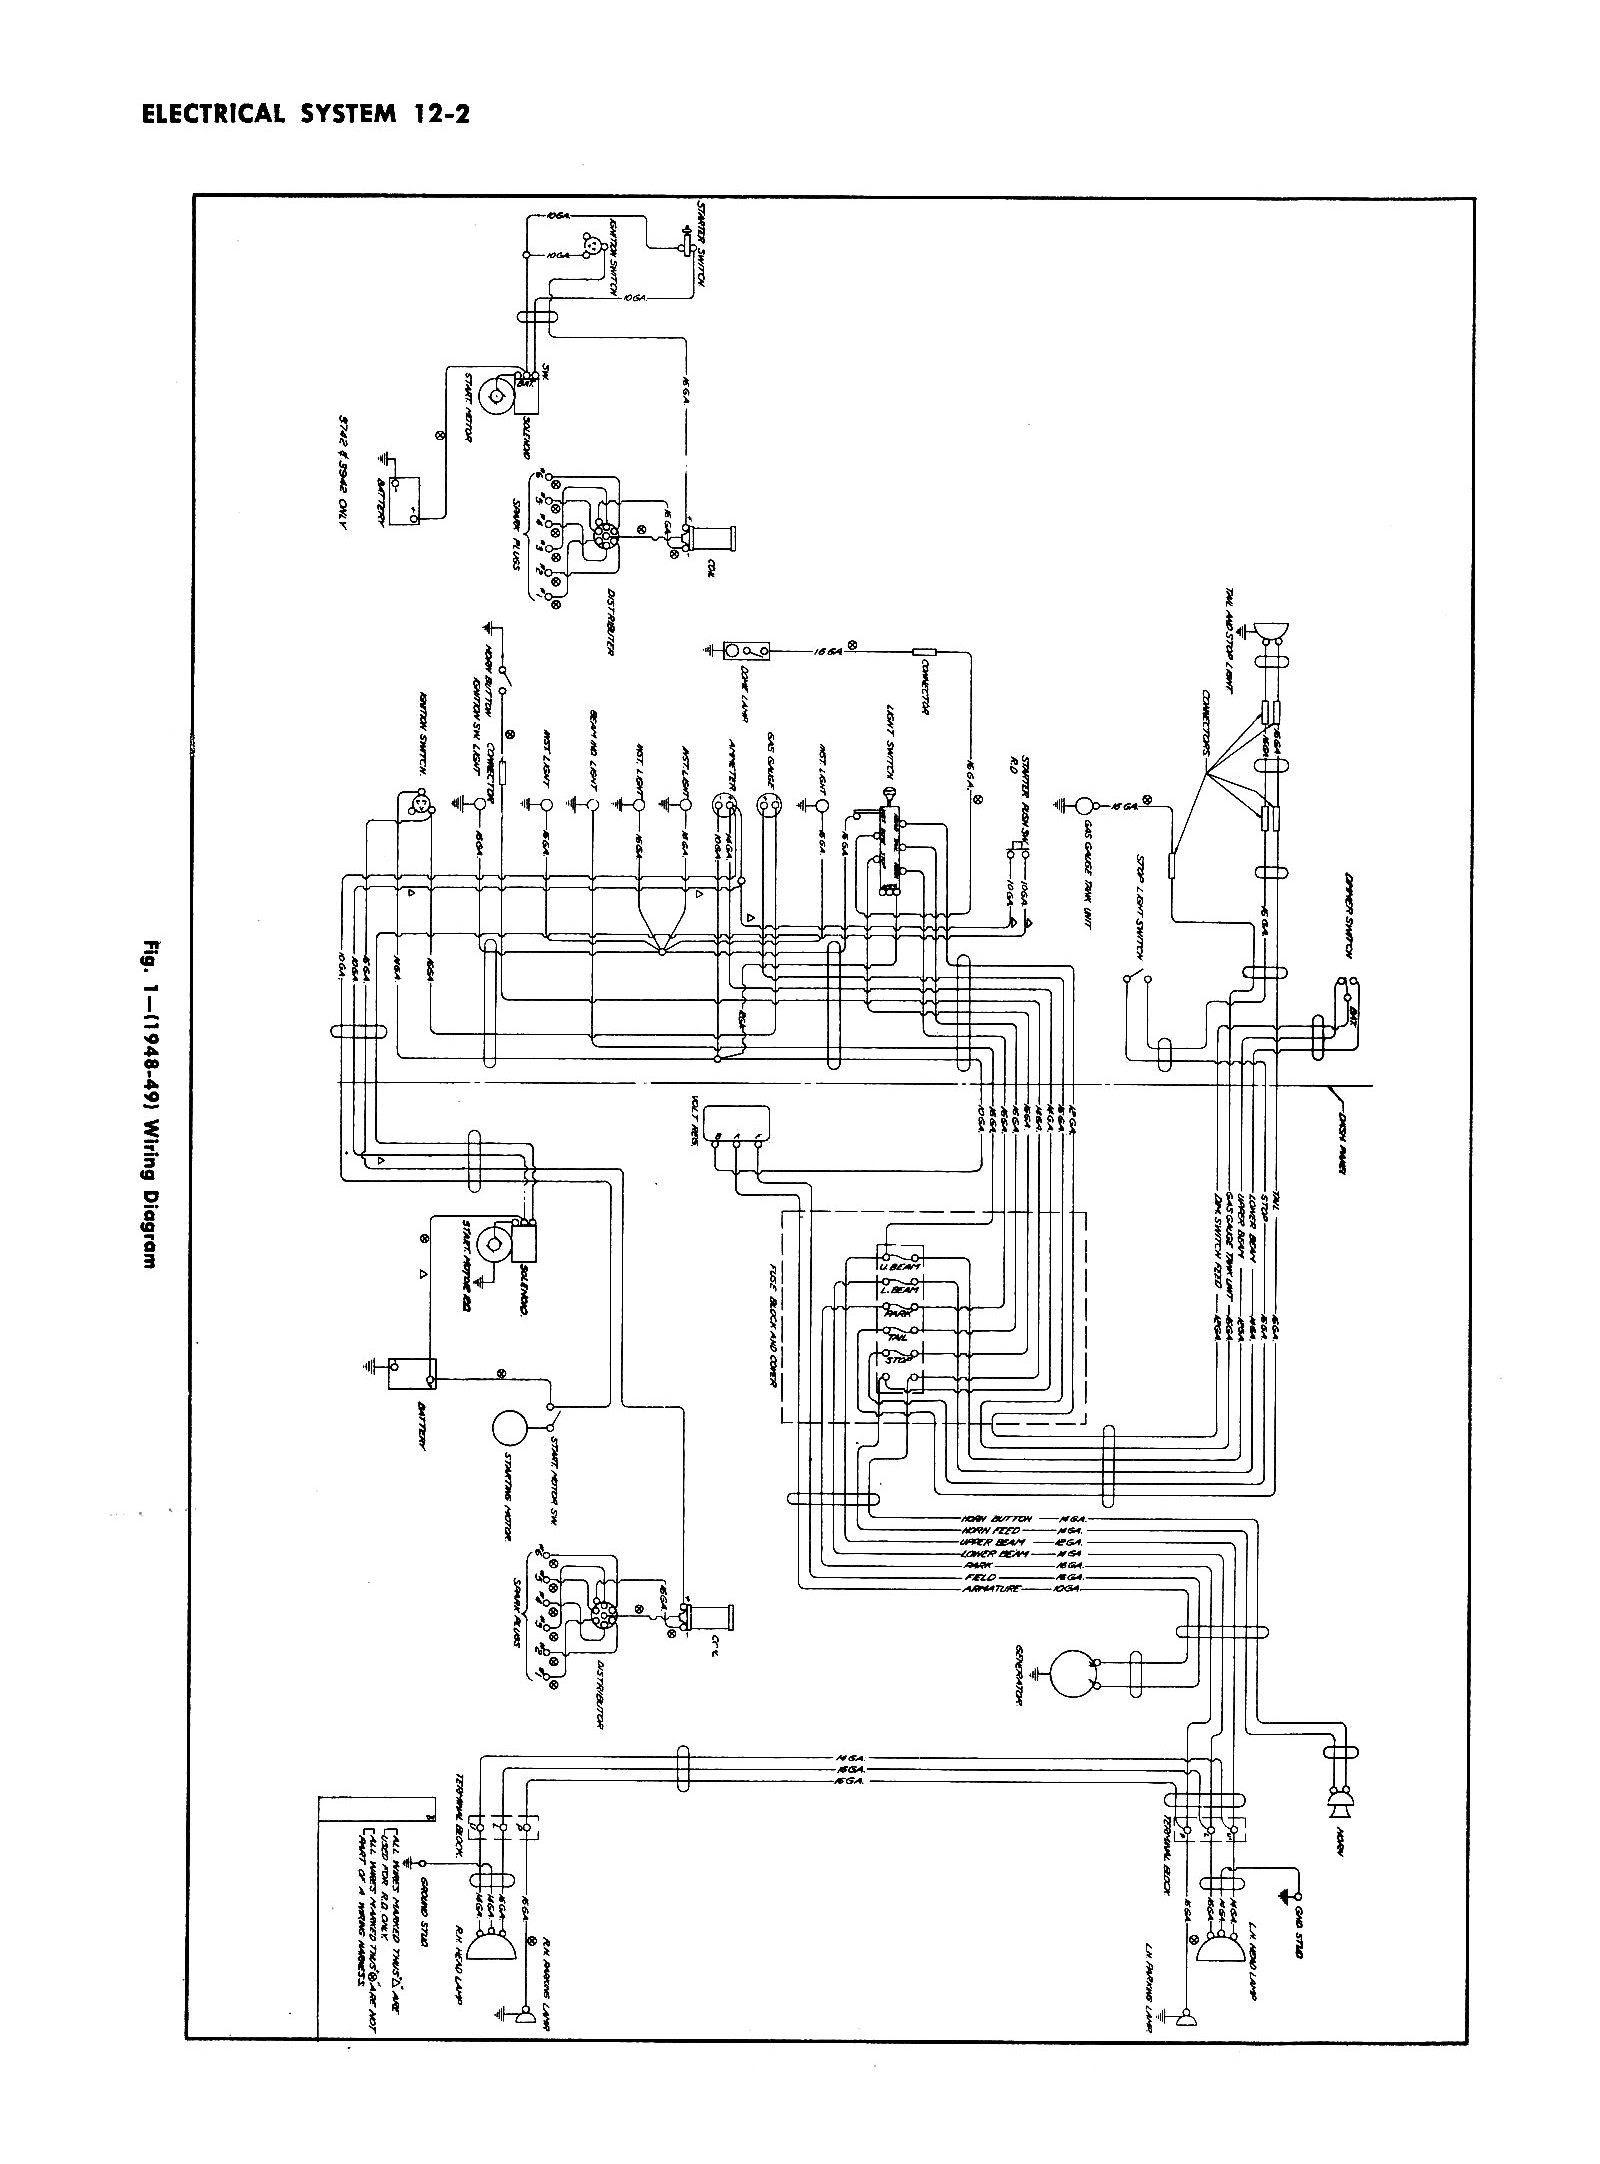 1955 Dodge Truck Wiring Diagram 76 Corvette Wiring Diagram Begeboy Wiring Diagram Source